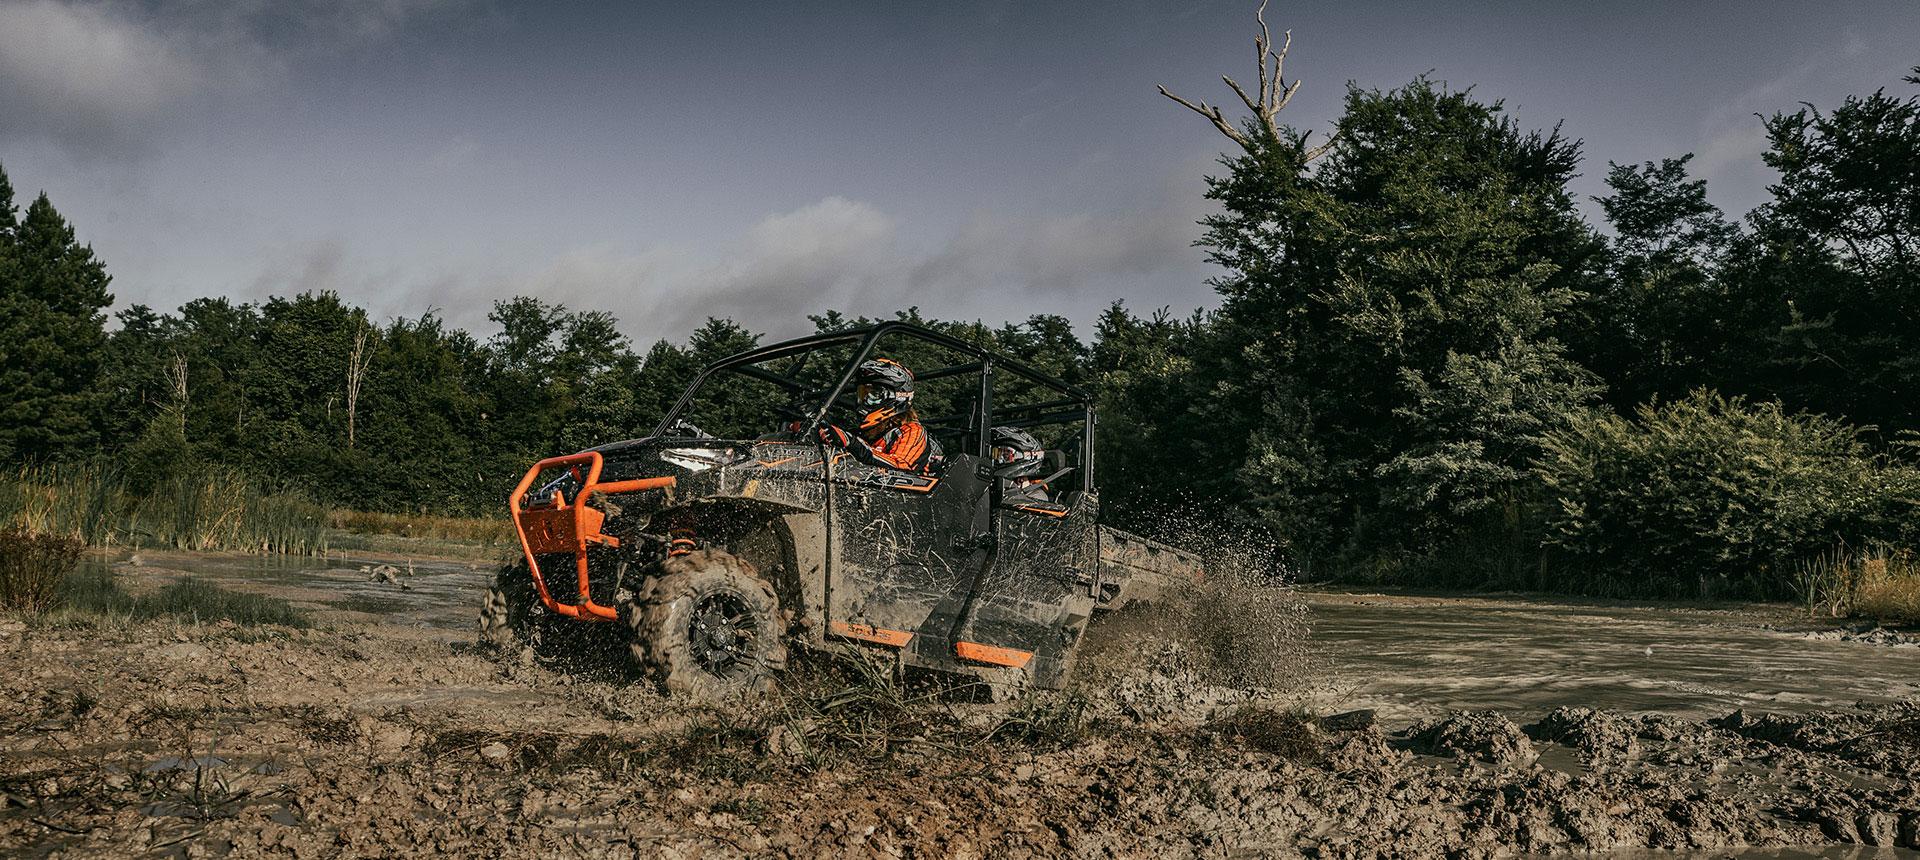 ranger-crew-xp-100-highlifter-media-18